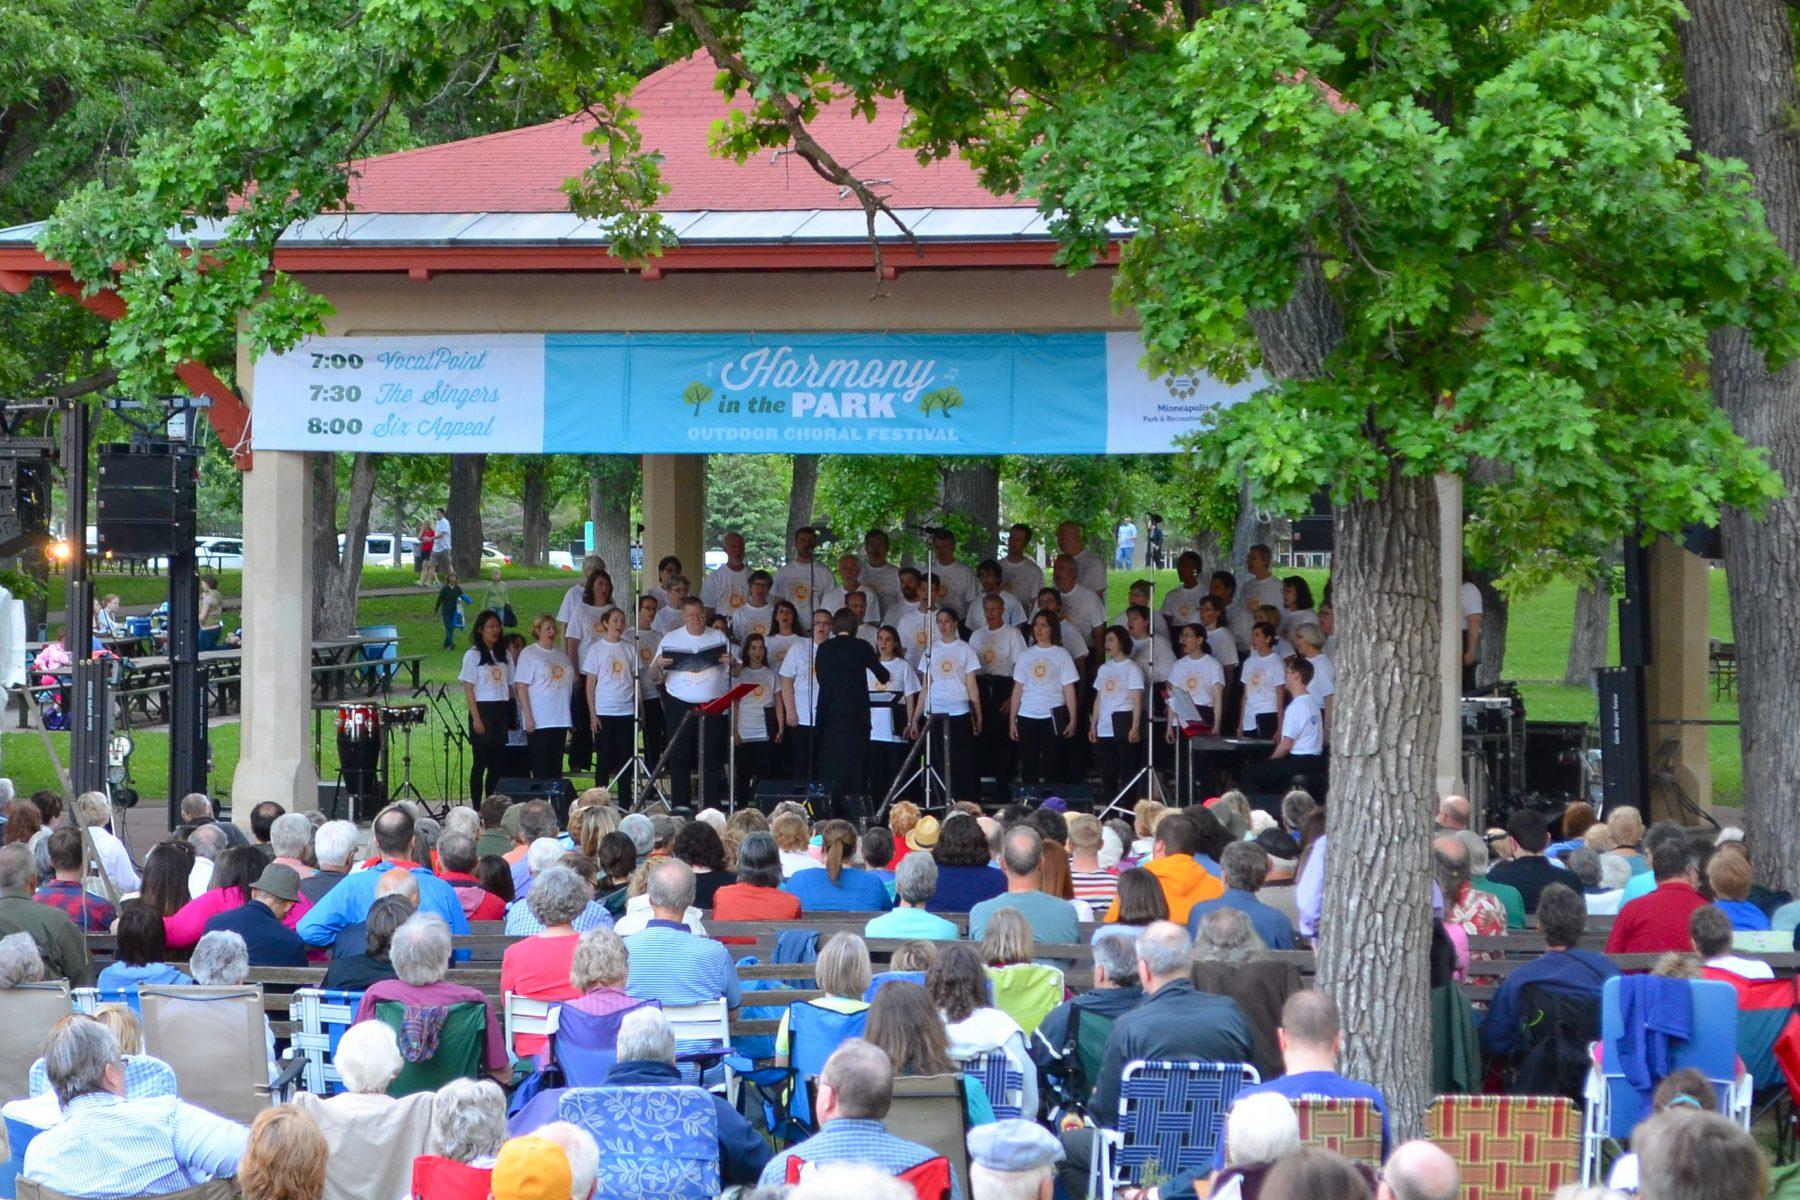 Minnesota Public Radio sponsored music in Minnehaha Park